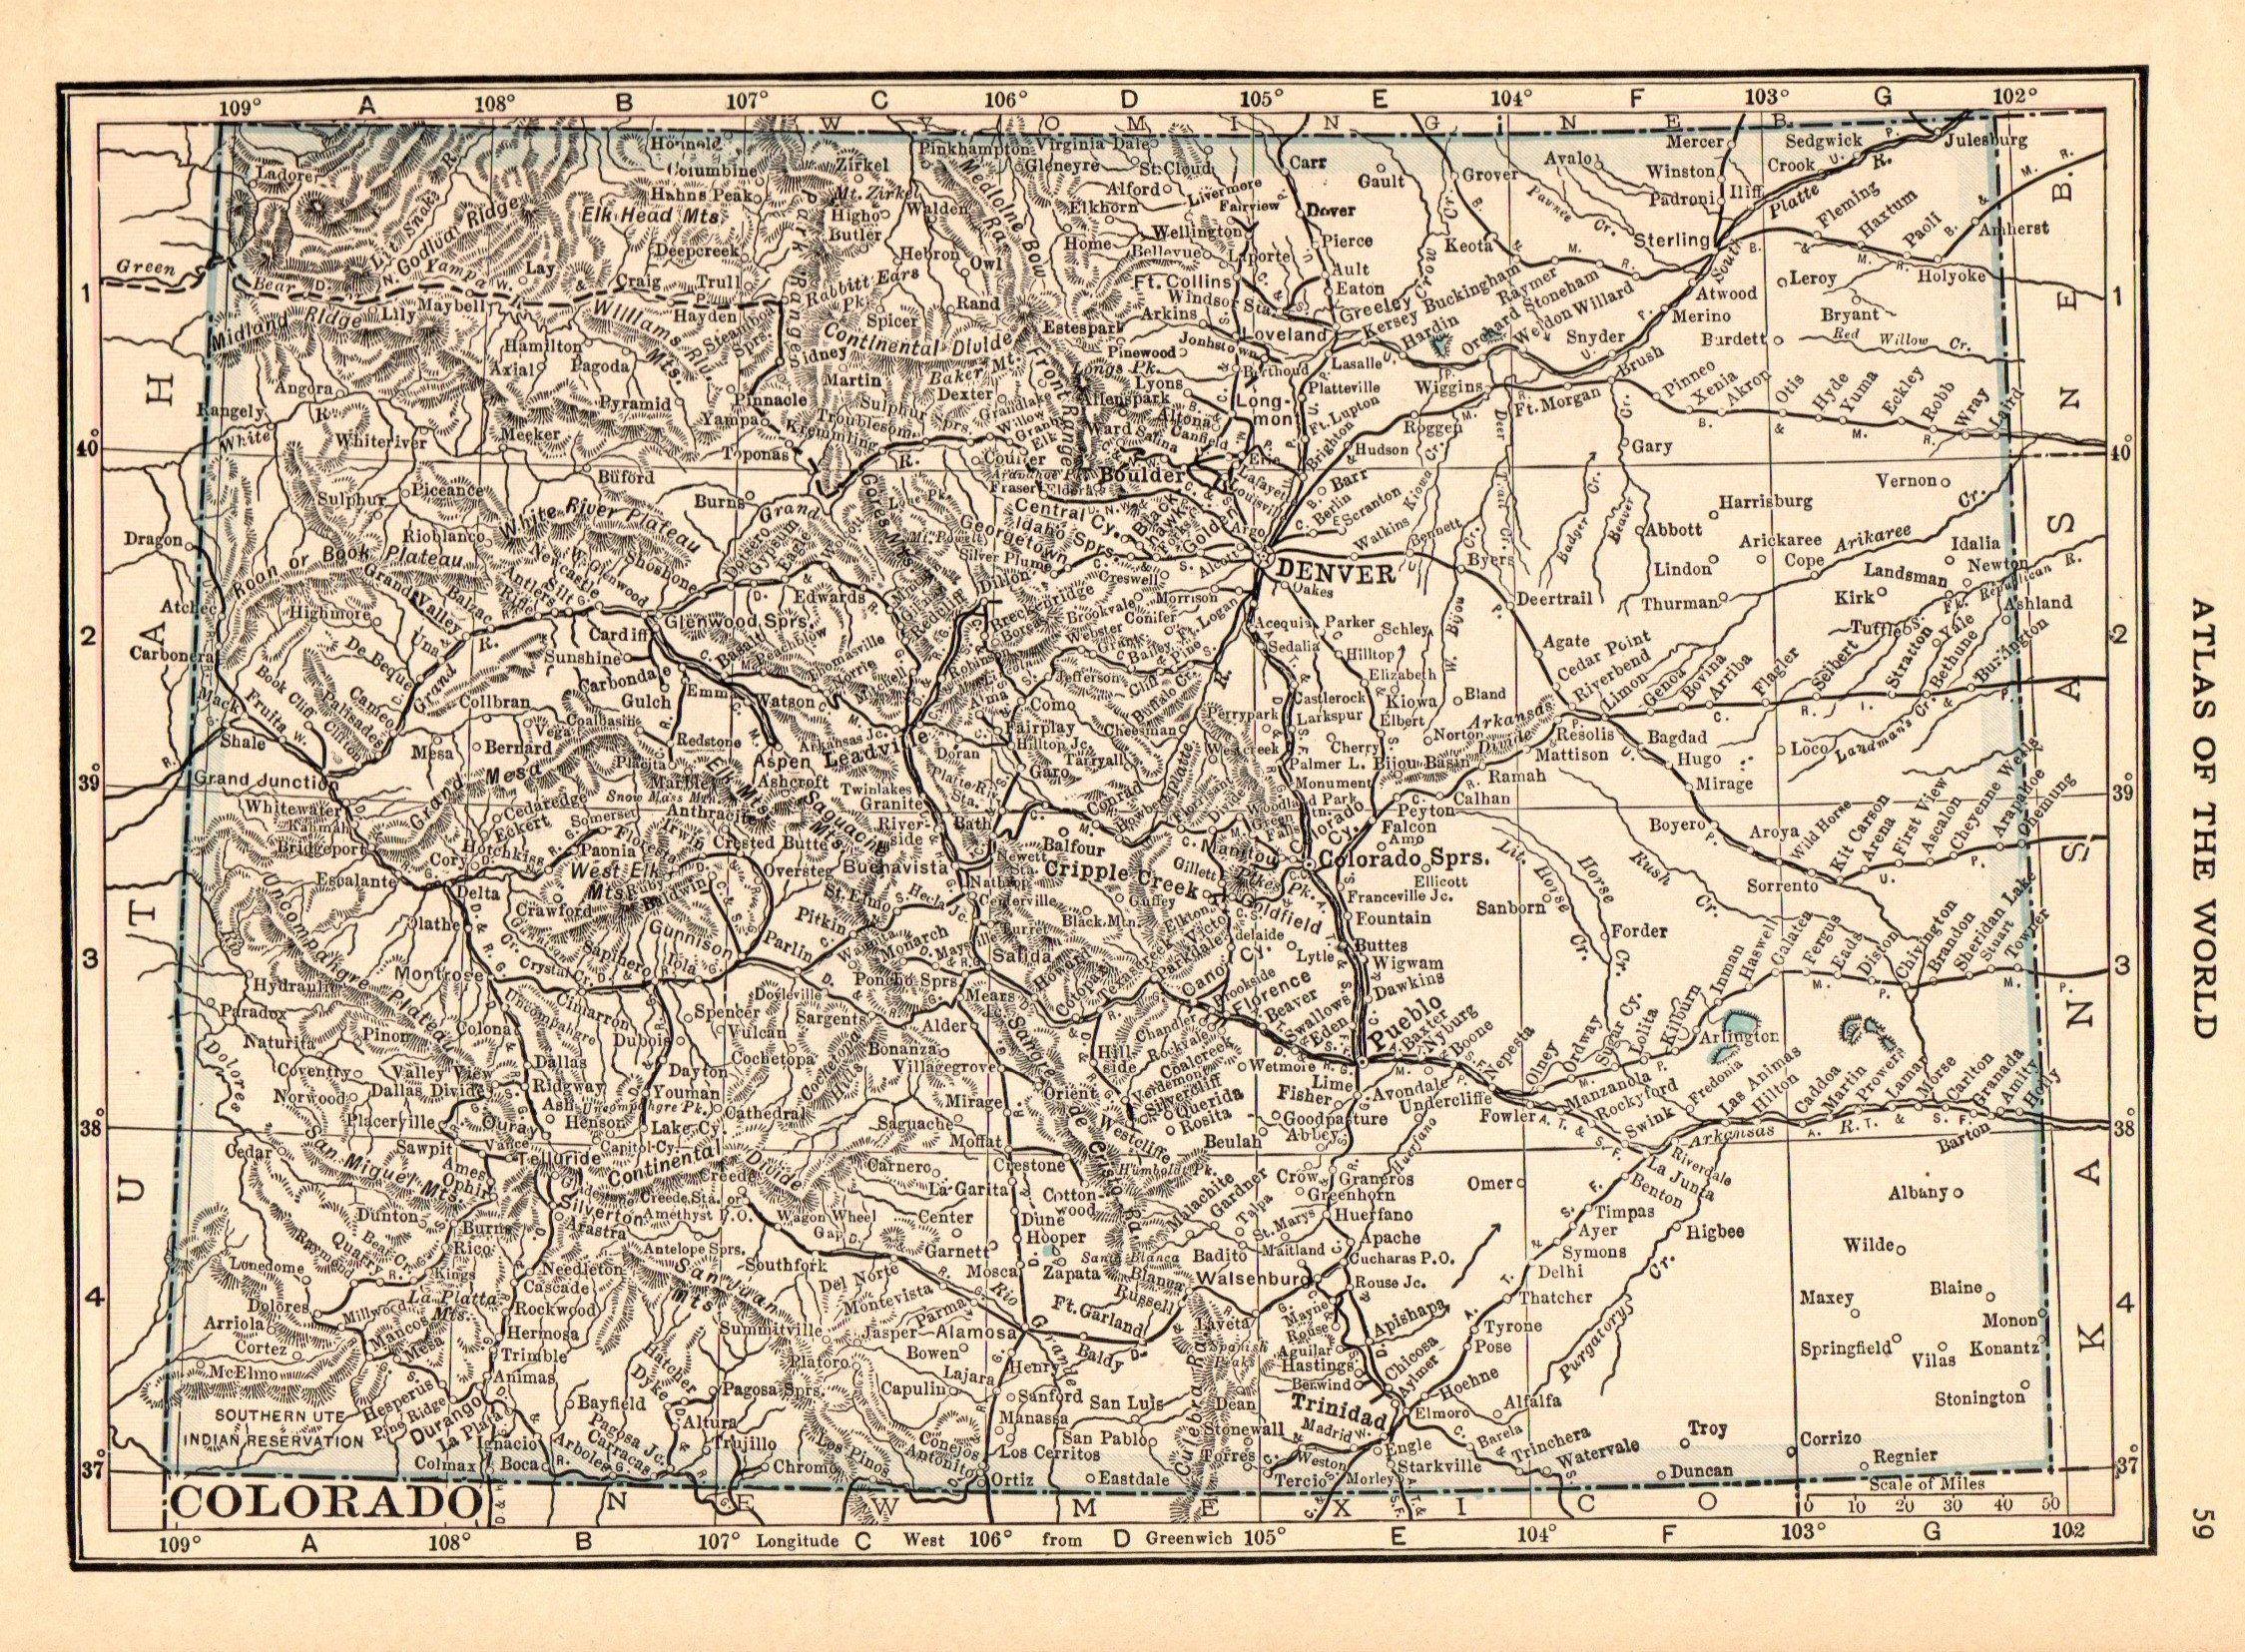 1916 Antique Colorado State Map Vintage Map Of Colorado Gallery Wall Art Decor Anniversary Gift For Birthday Wedding Haw Colorado Map Vintage Maps Vintage Map